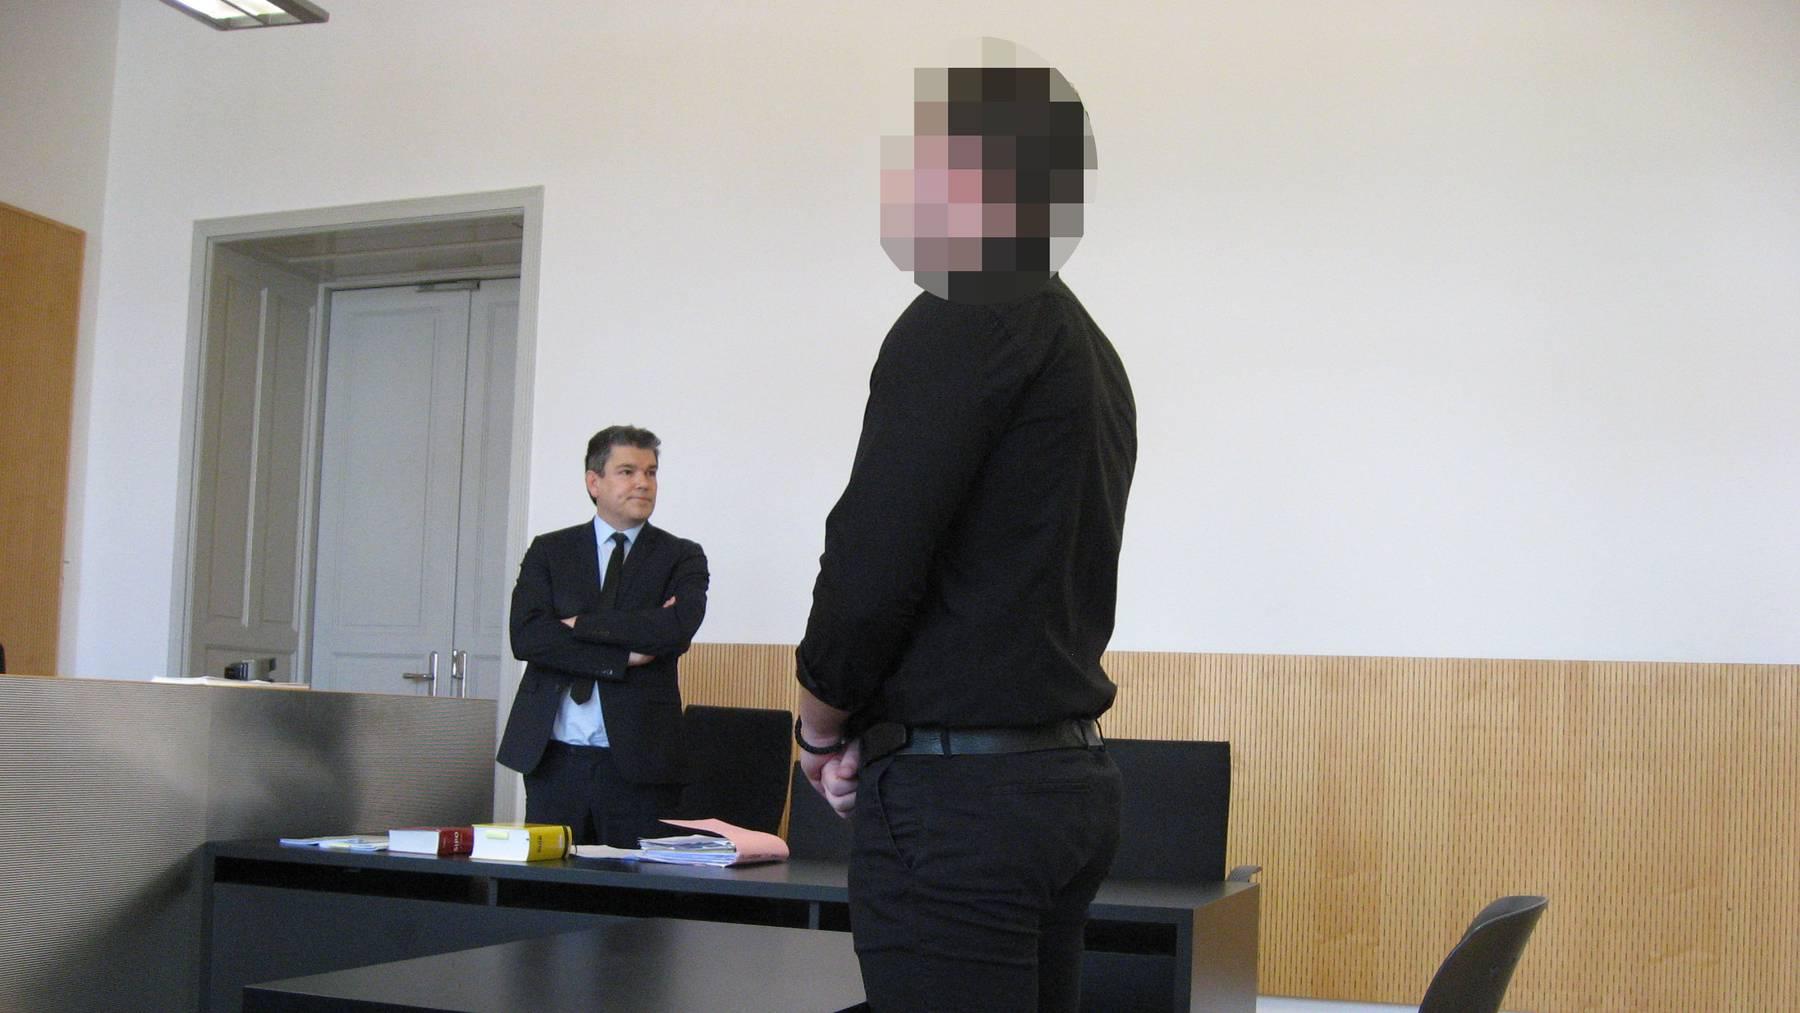 Bankräuber Sparkasse Lustenau vor Gericht